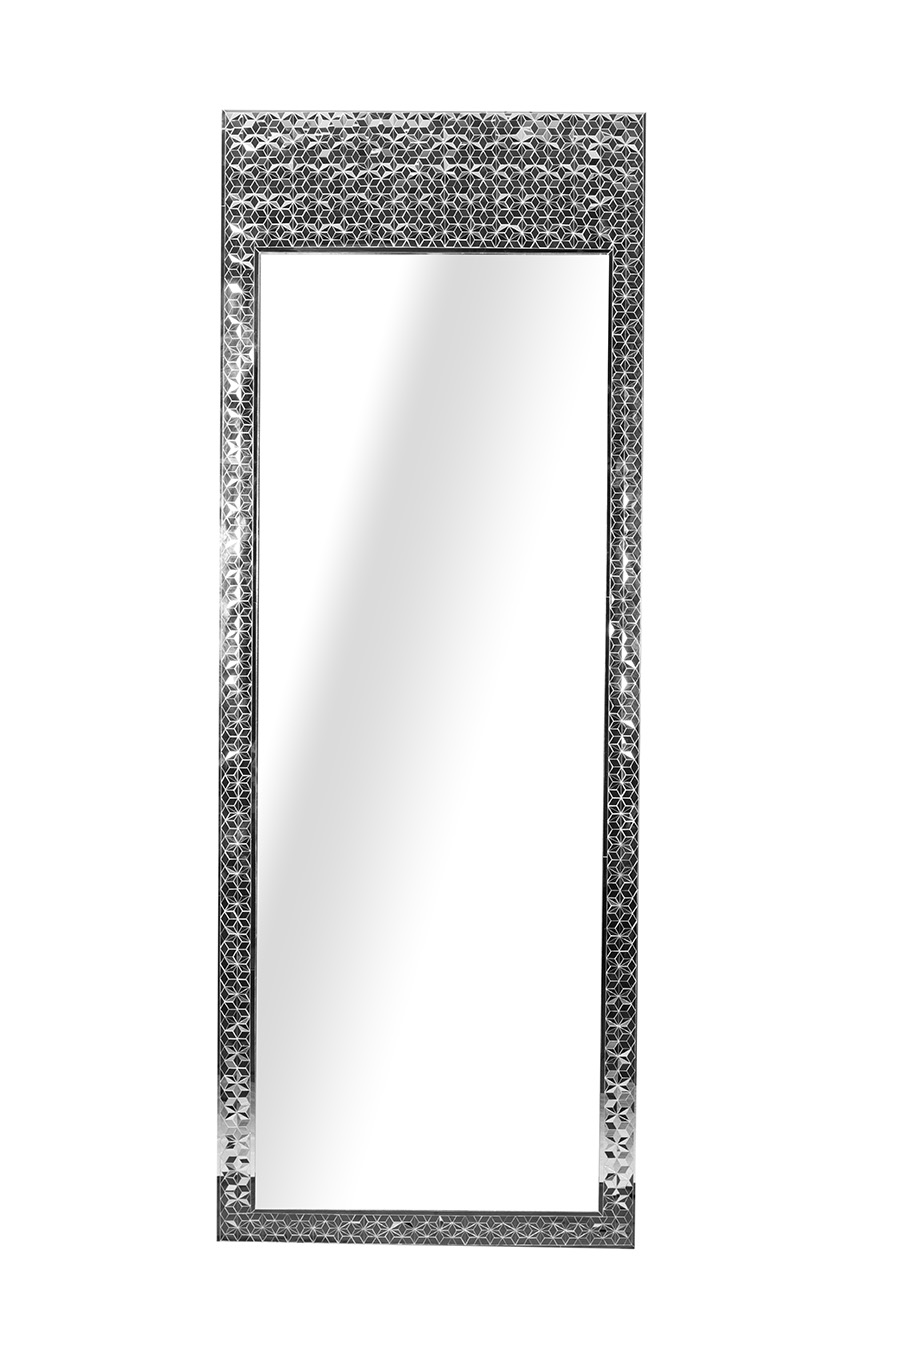 partow standing mirror